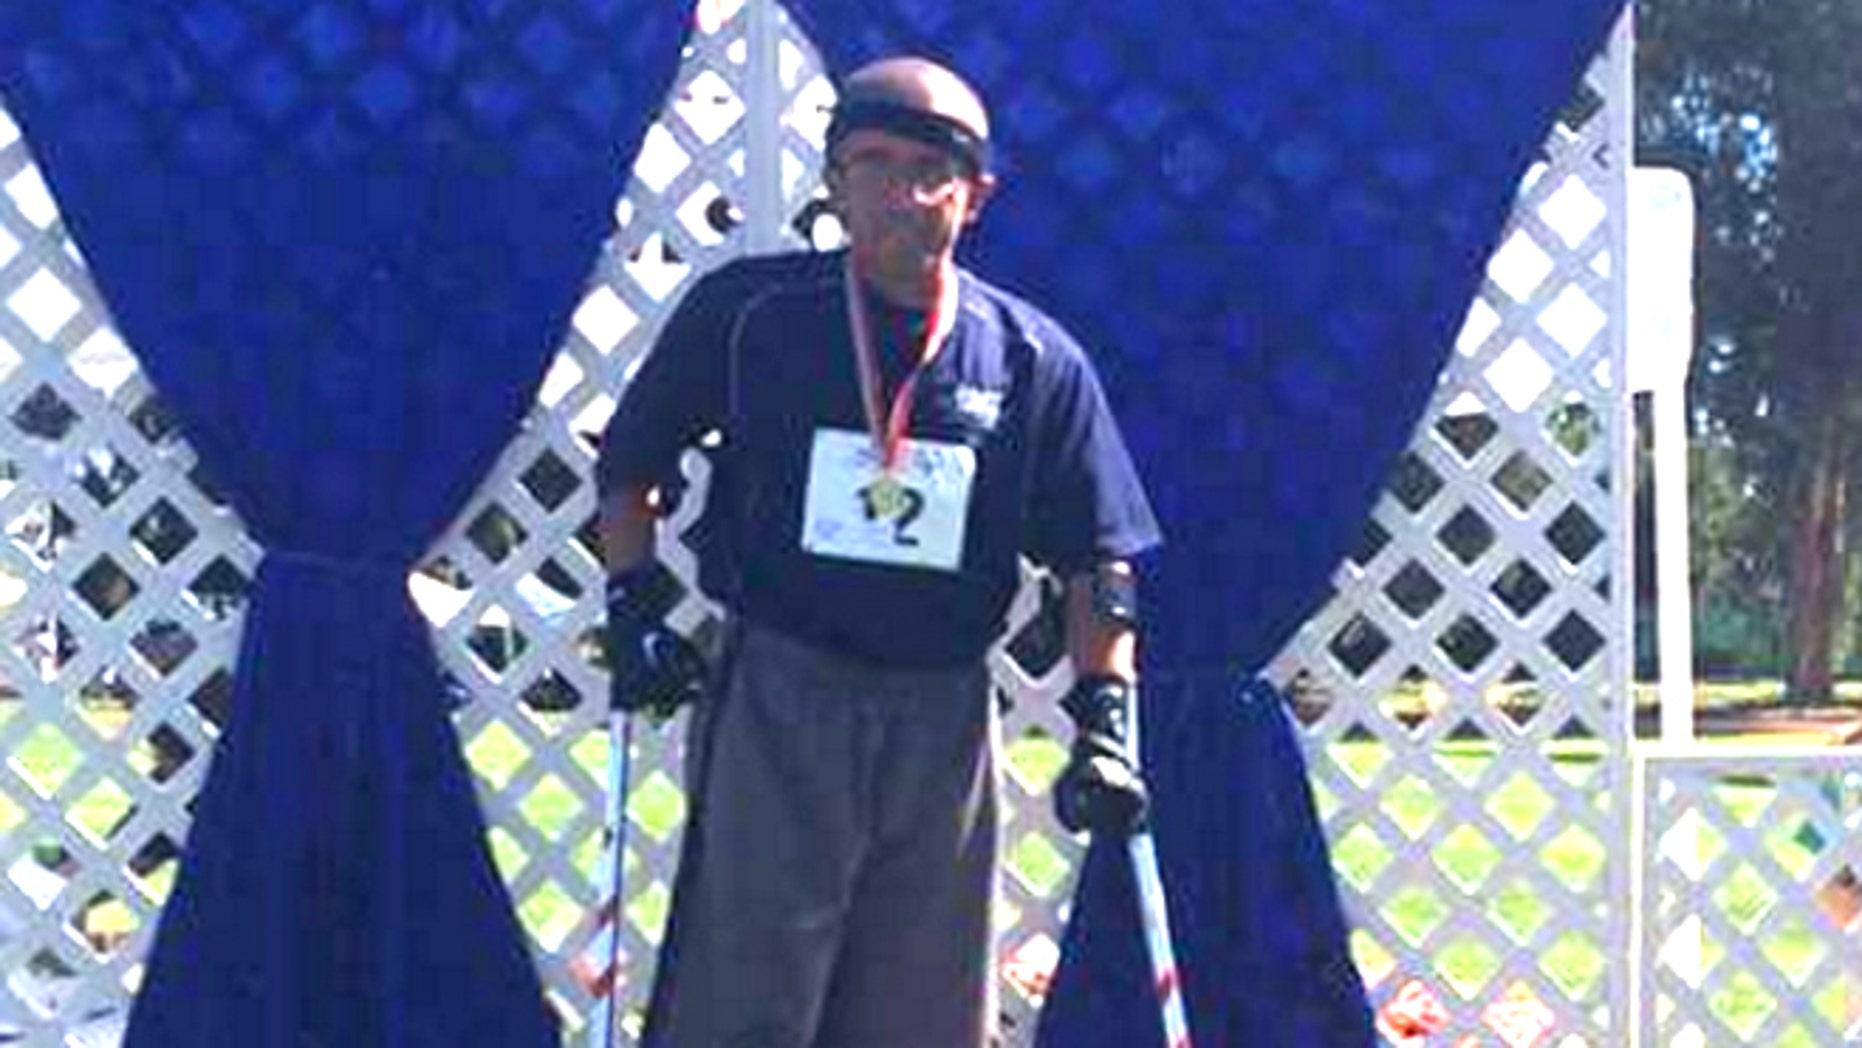 Edward Garcia, an 11-time Special Olympian